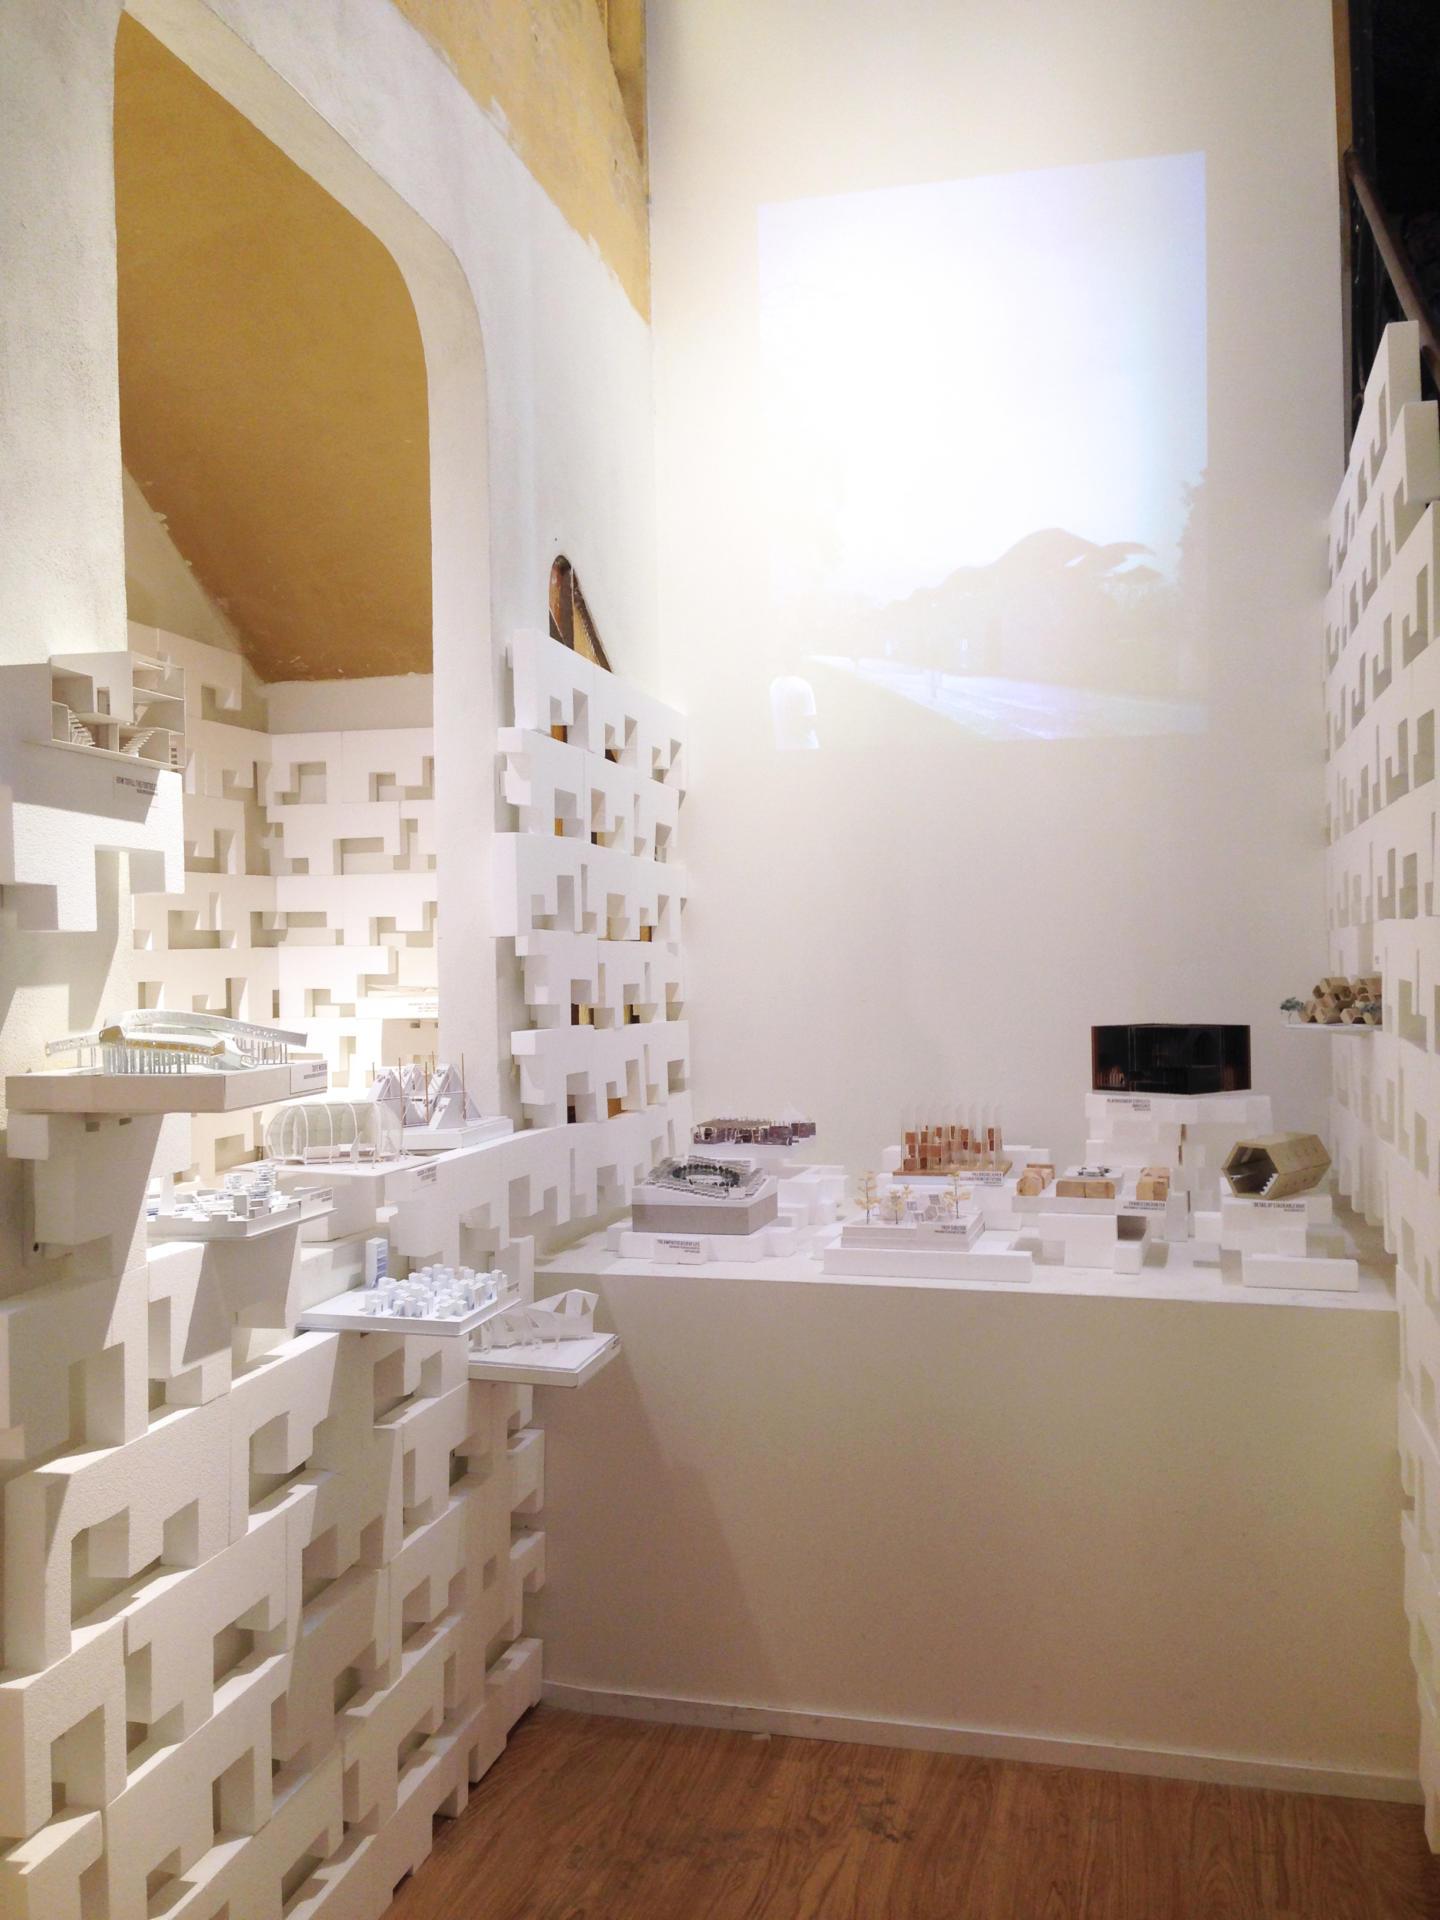 budipradono architects fortress europe